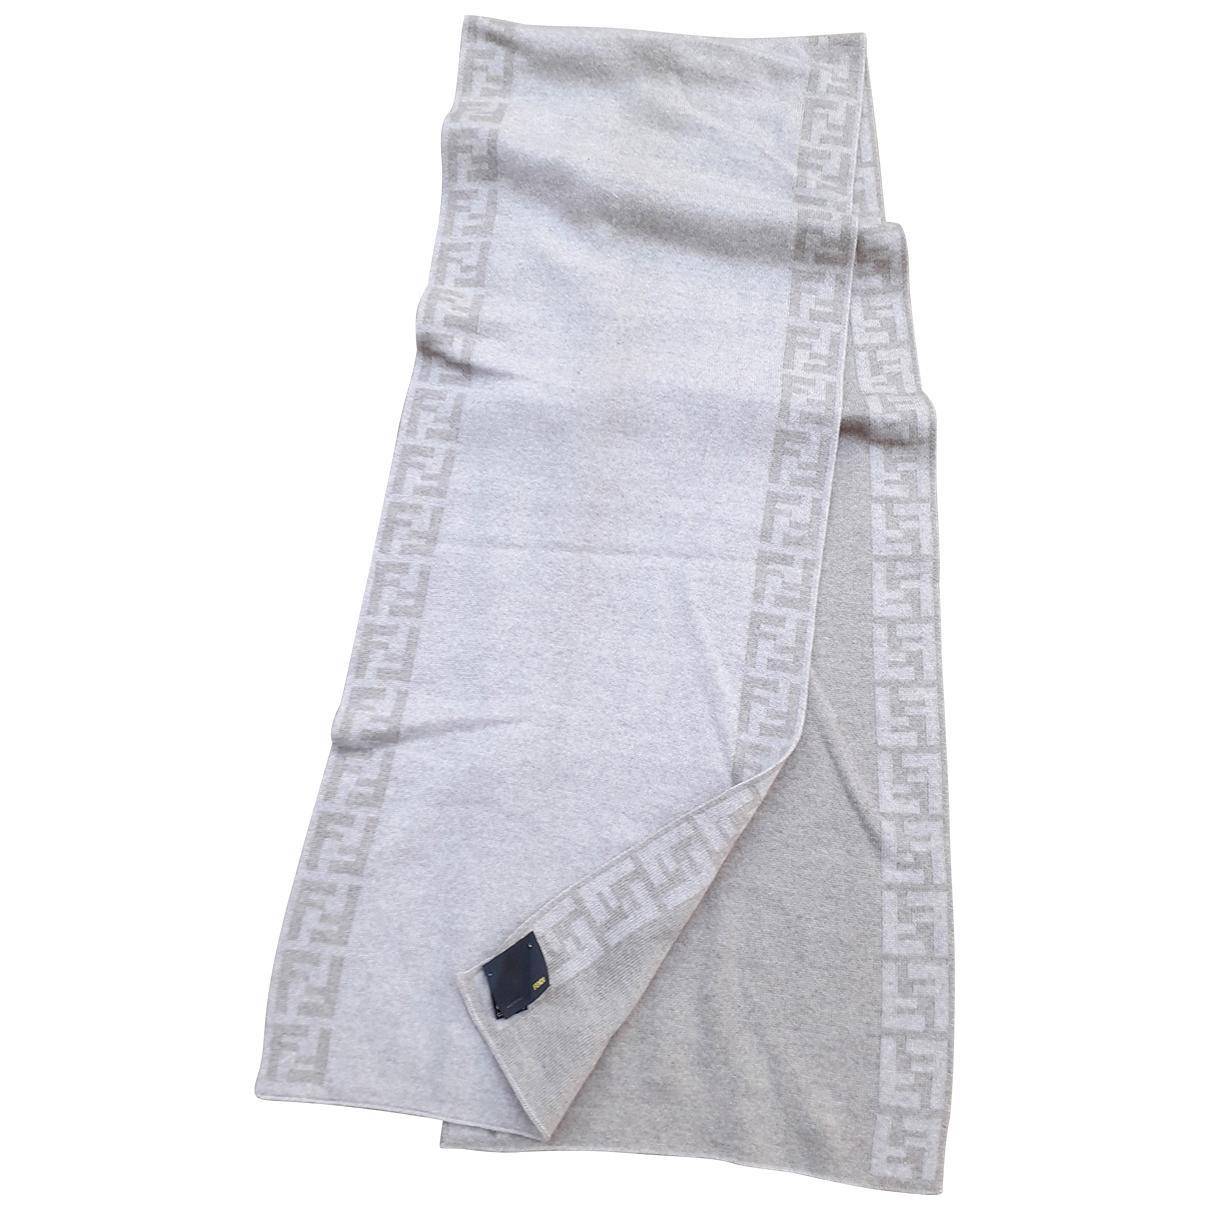 Fendi \N Beige Wool scarf for Women \N